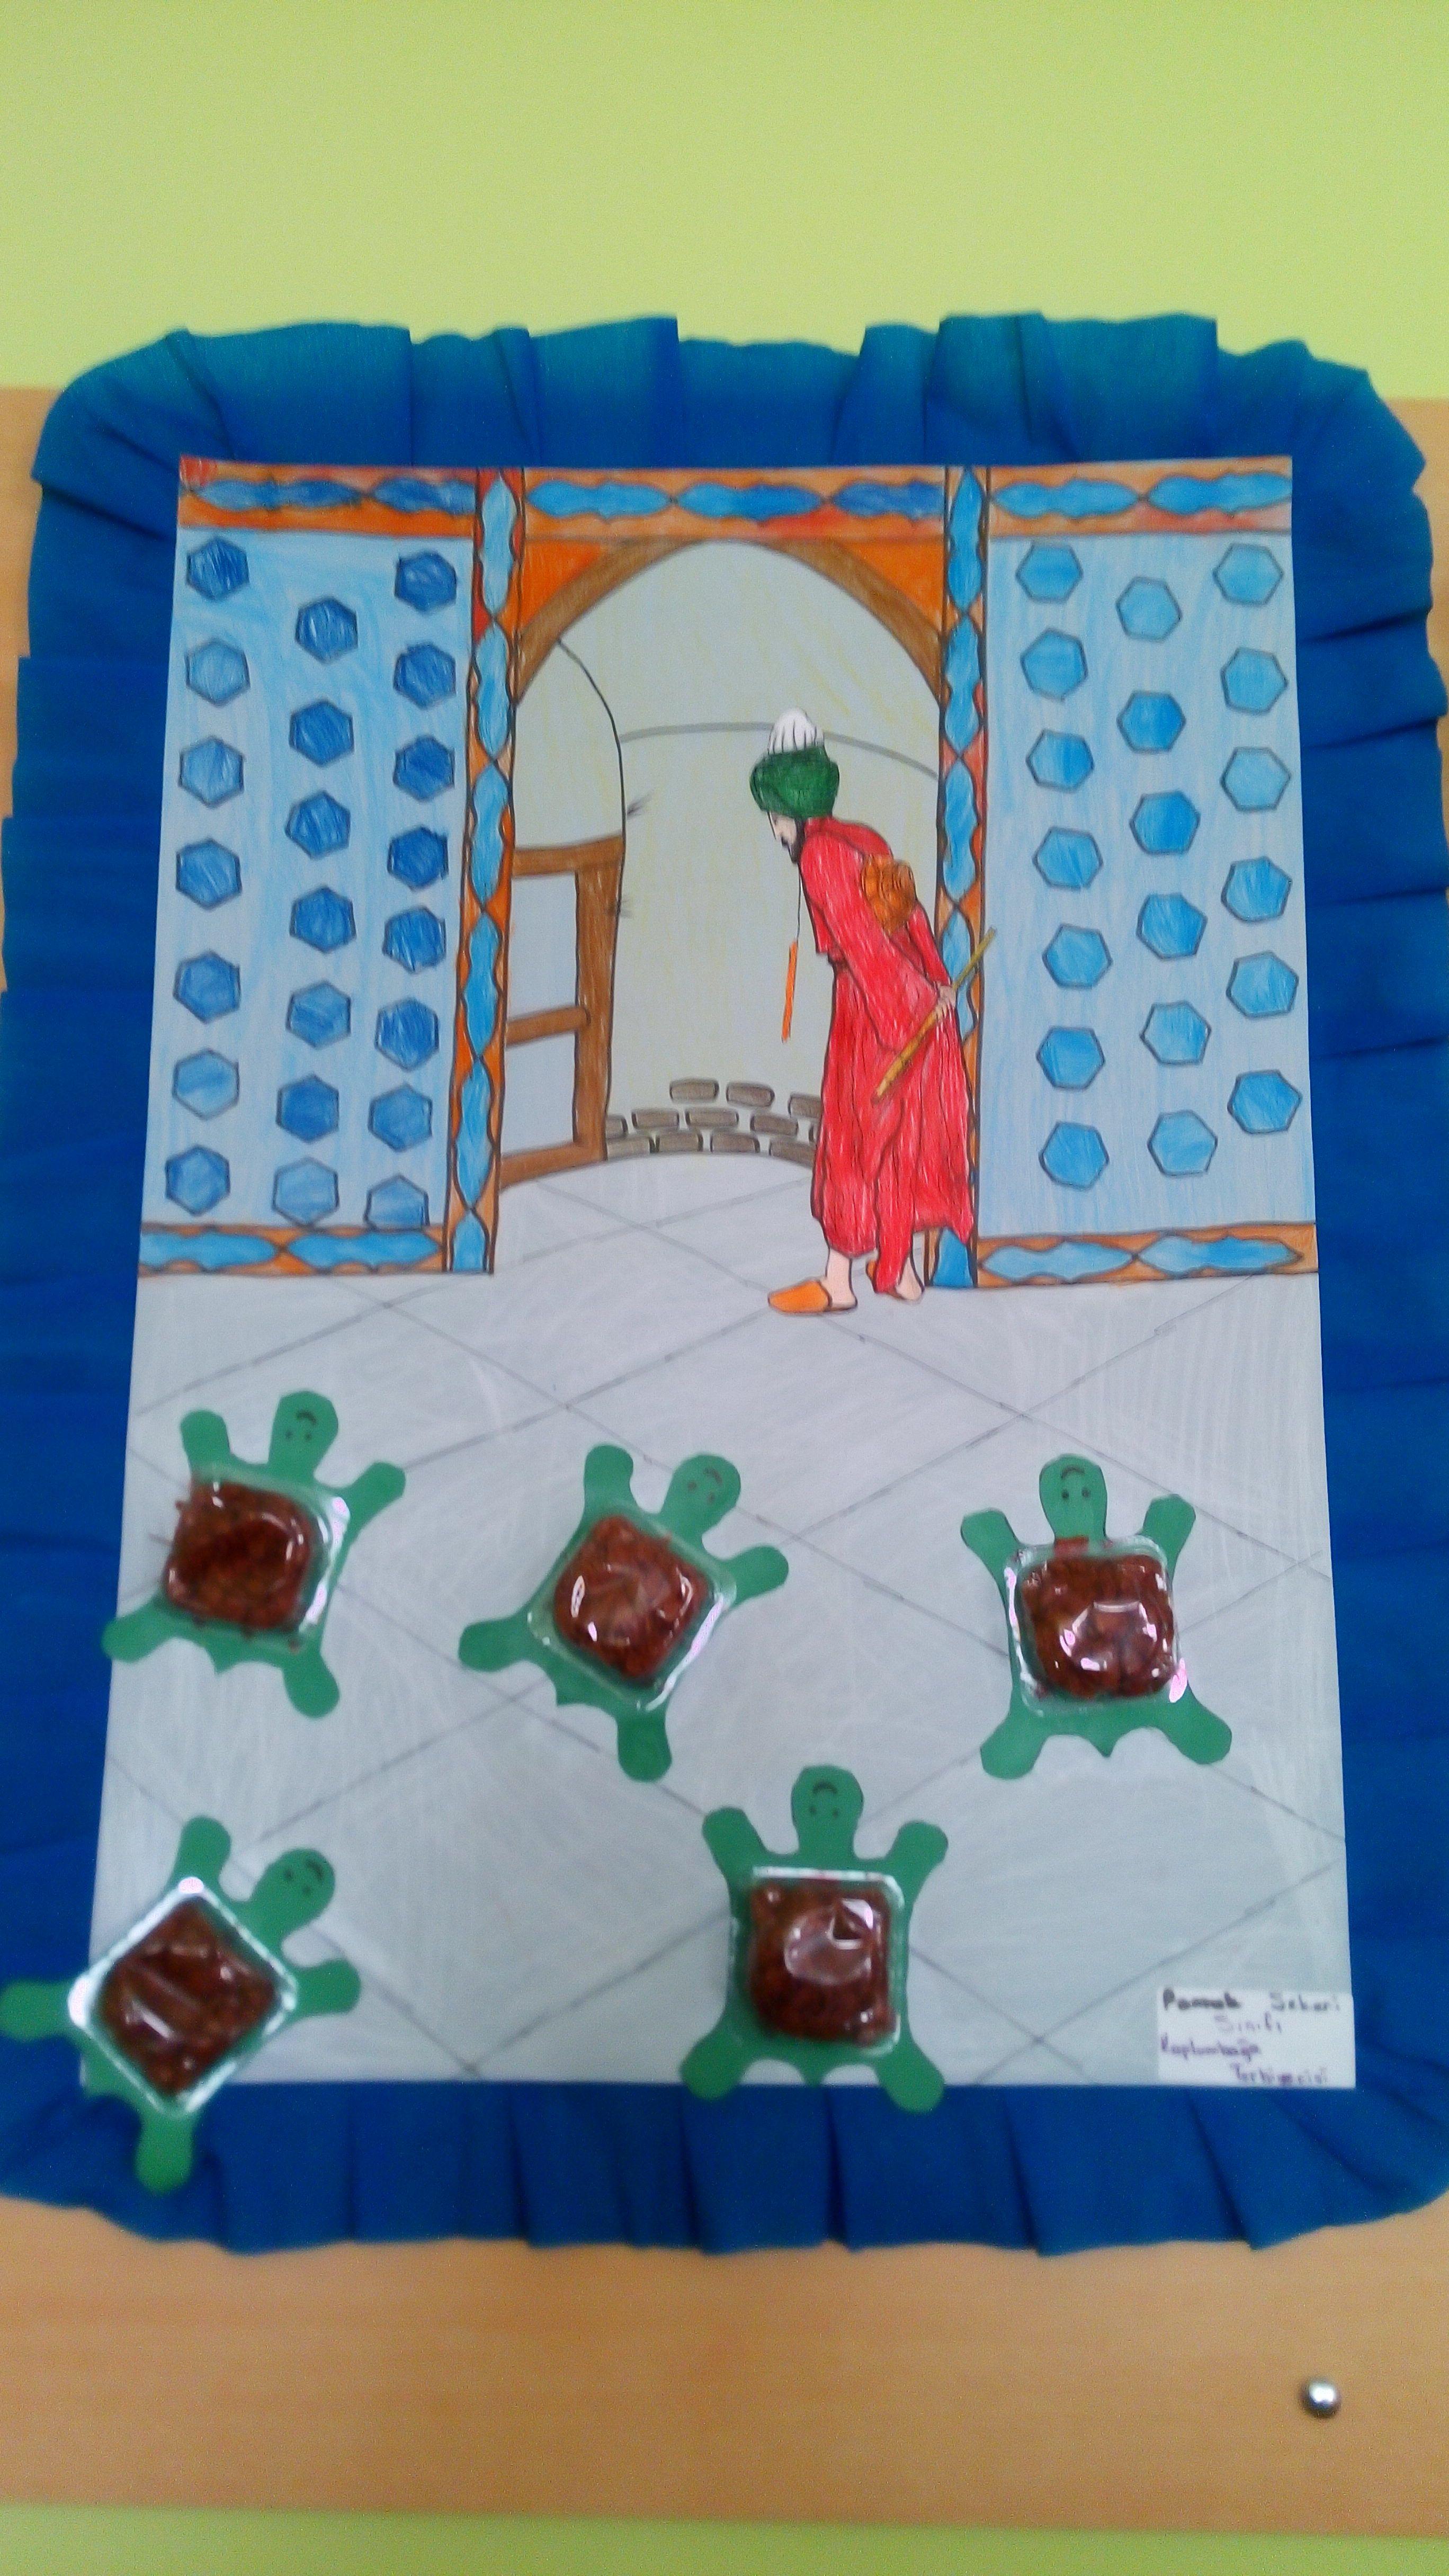 Osman Hamdi Bey Kaplumbaga Terbiyecisi Sanat Egitimi Okul